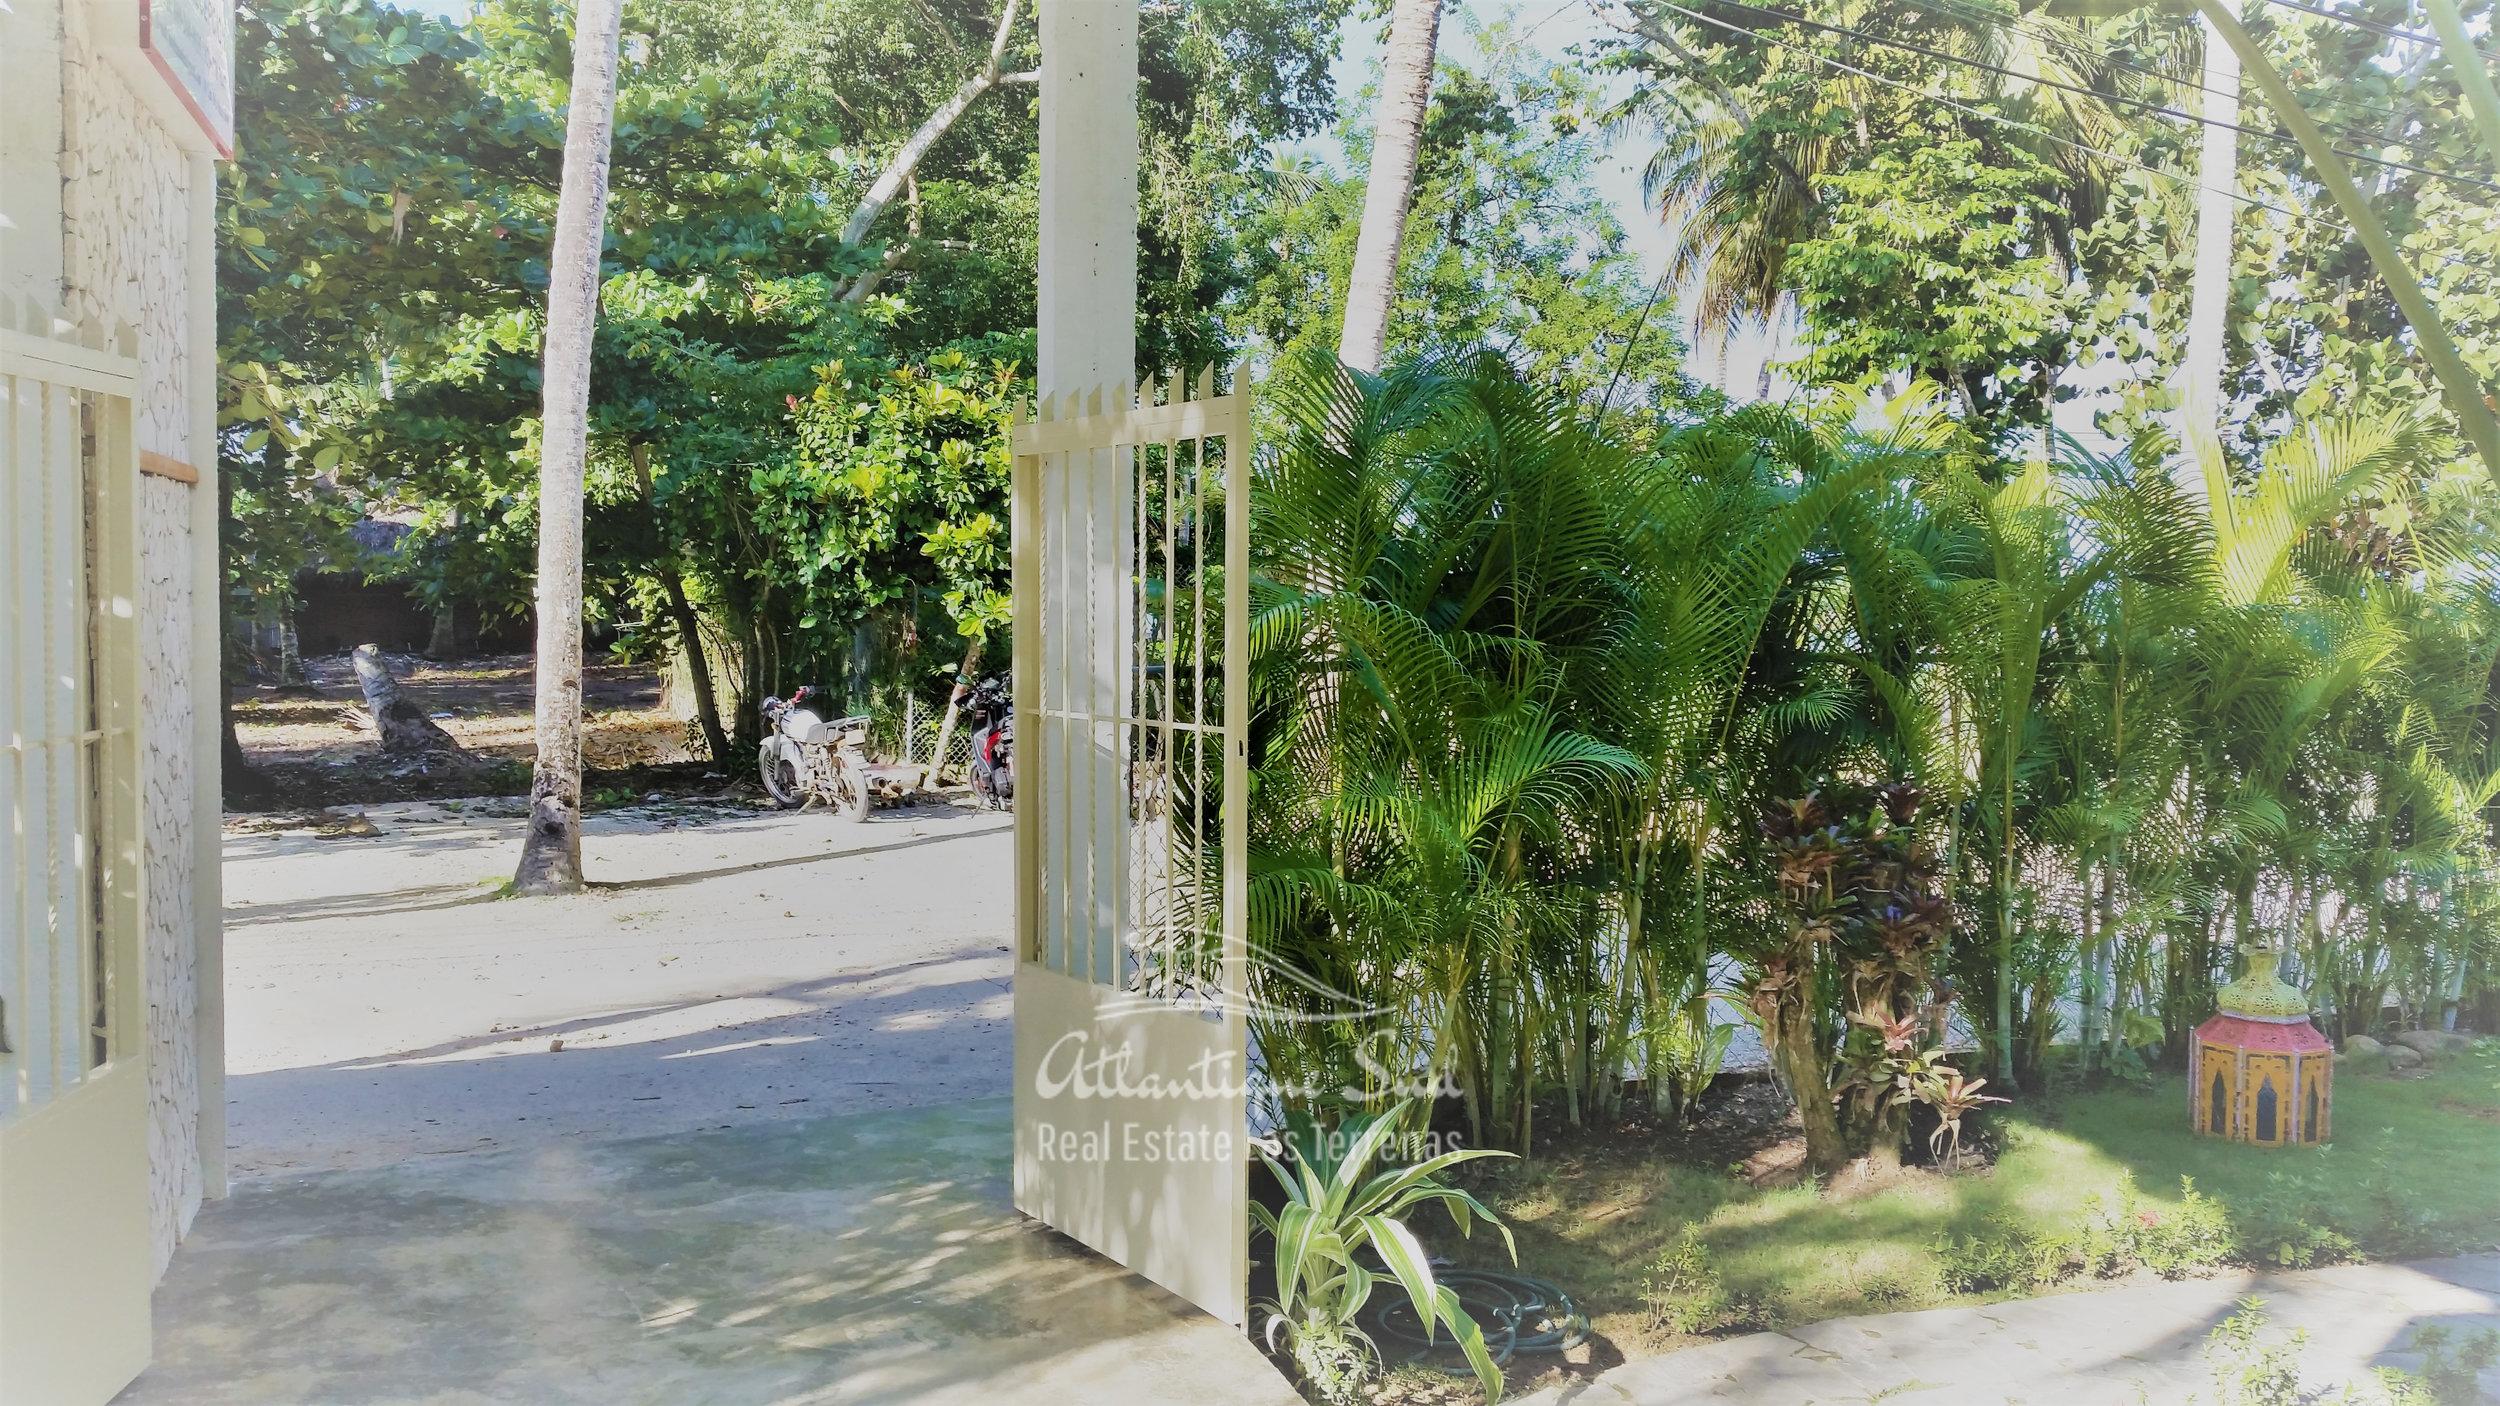 Small hotel for sale next to the beach Real Estate Las Terrenas Atlantique Sud Dominican Republic15.jpg